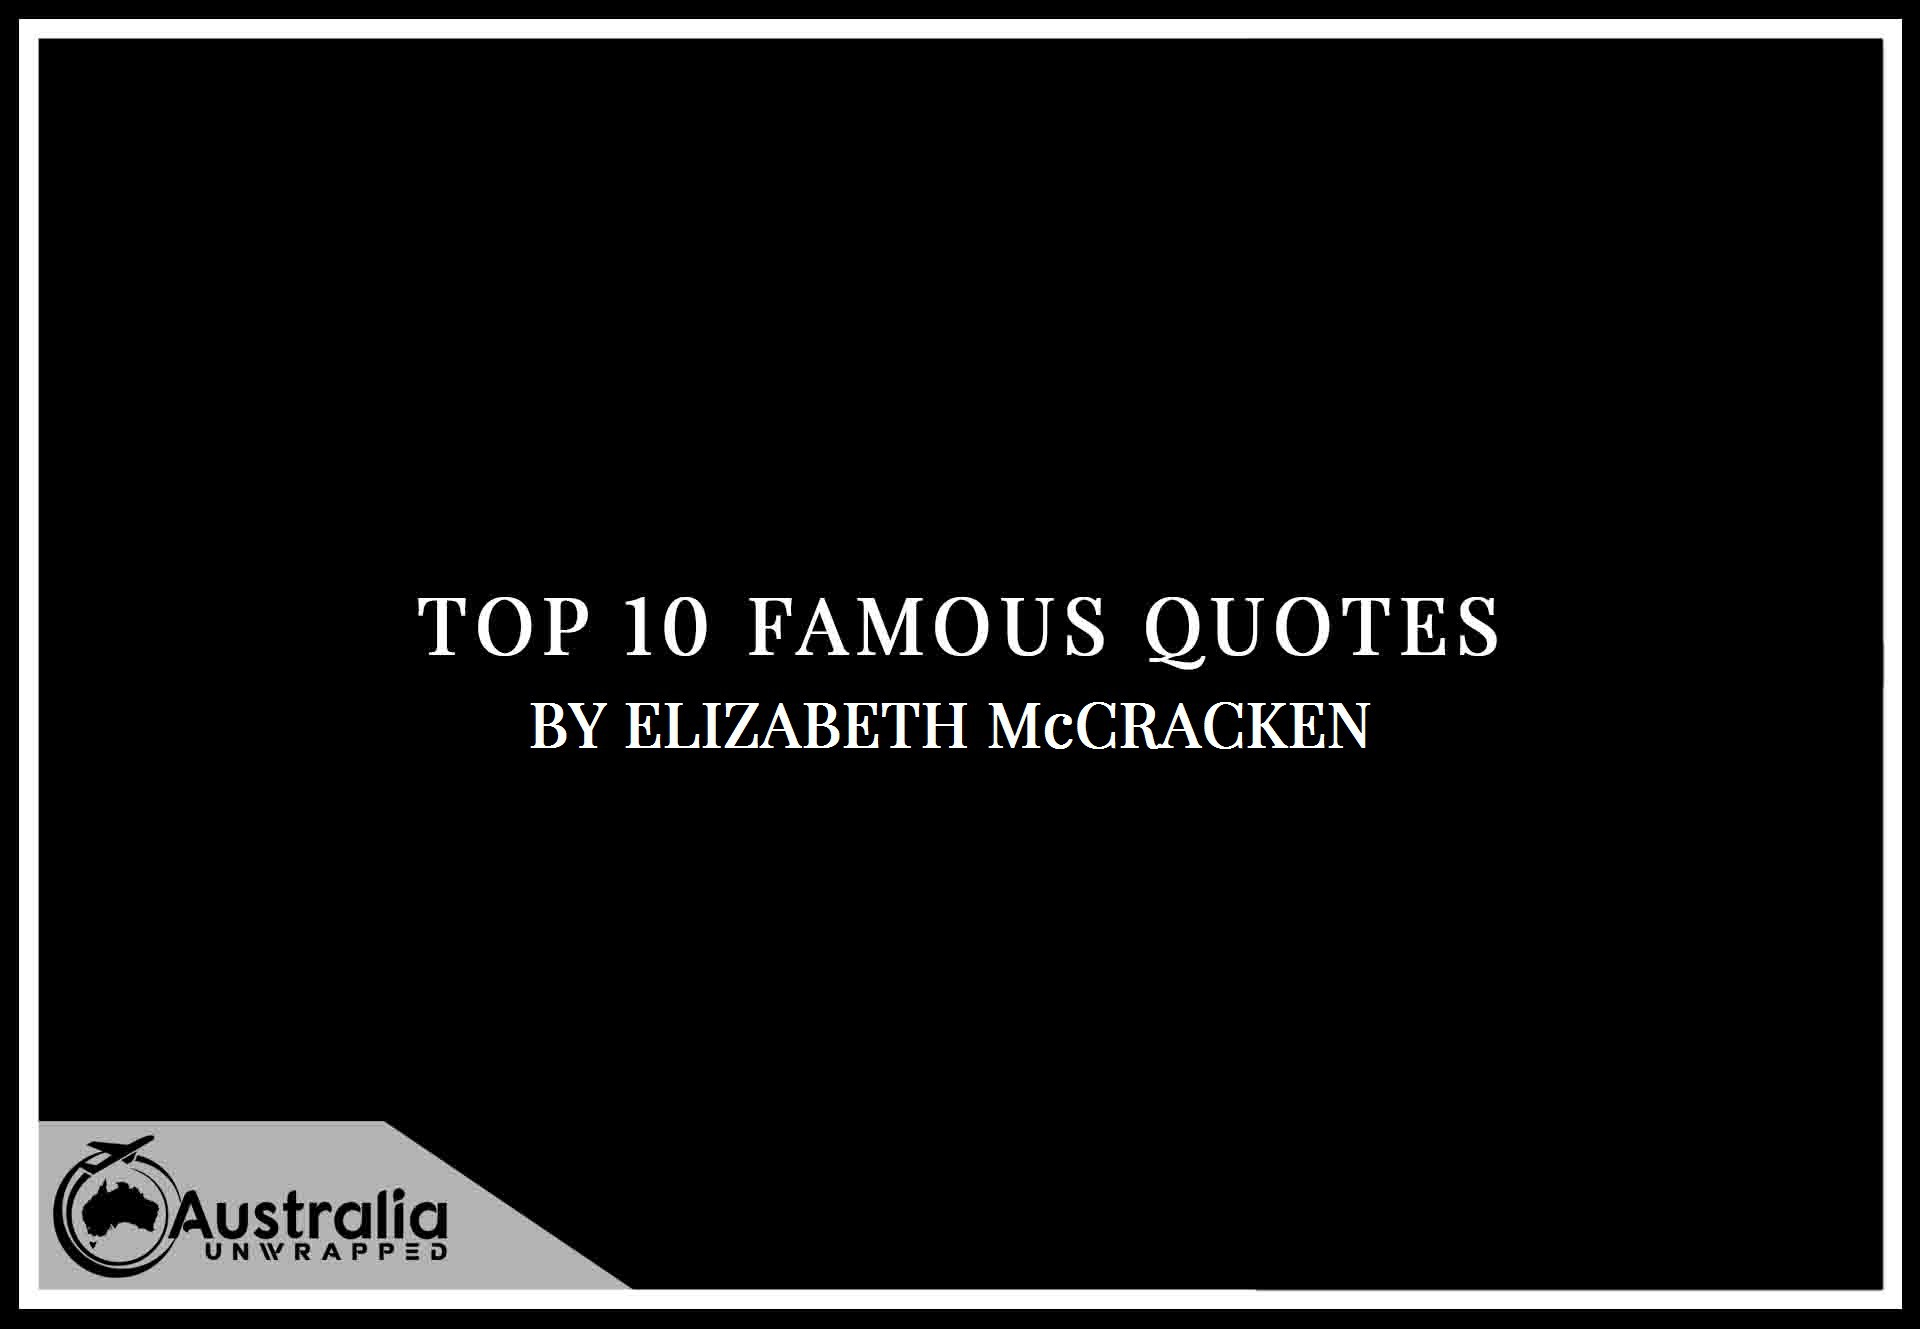 Elizabeth McCracken's Top 10 Popular and Famous Quotes